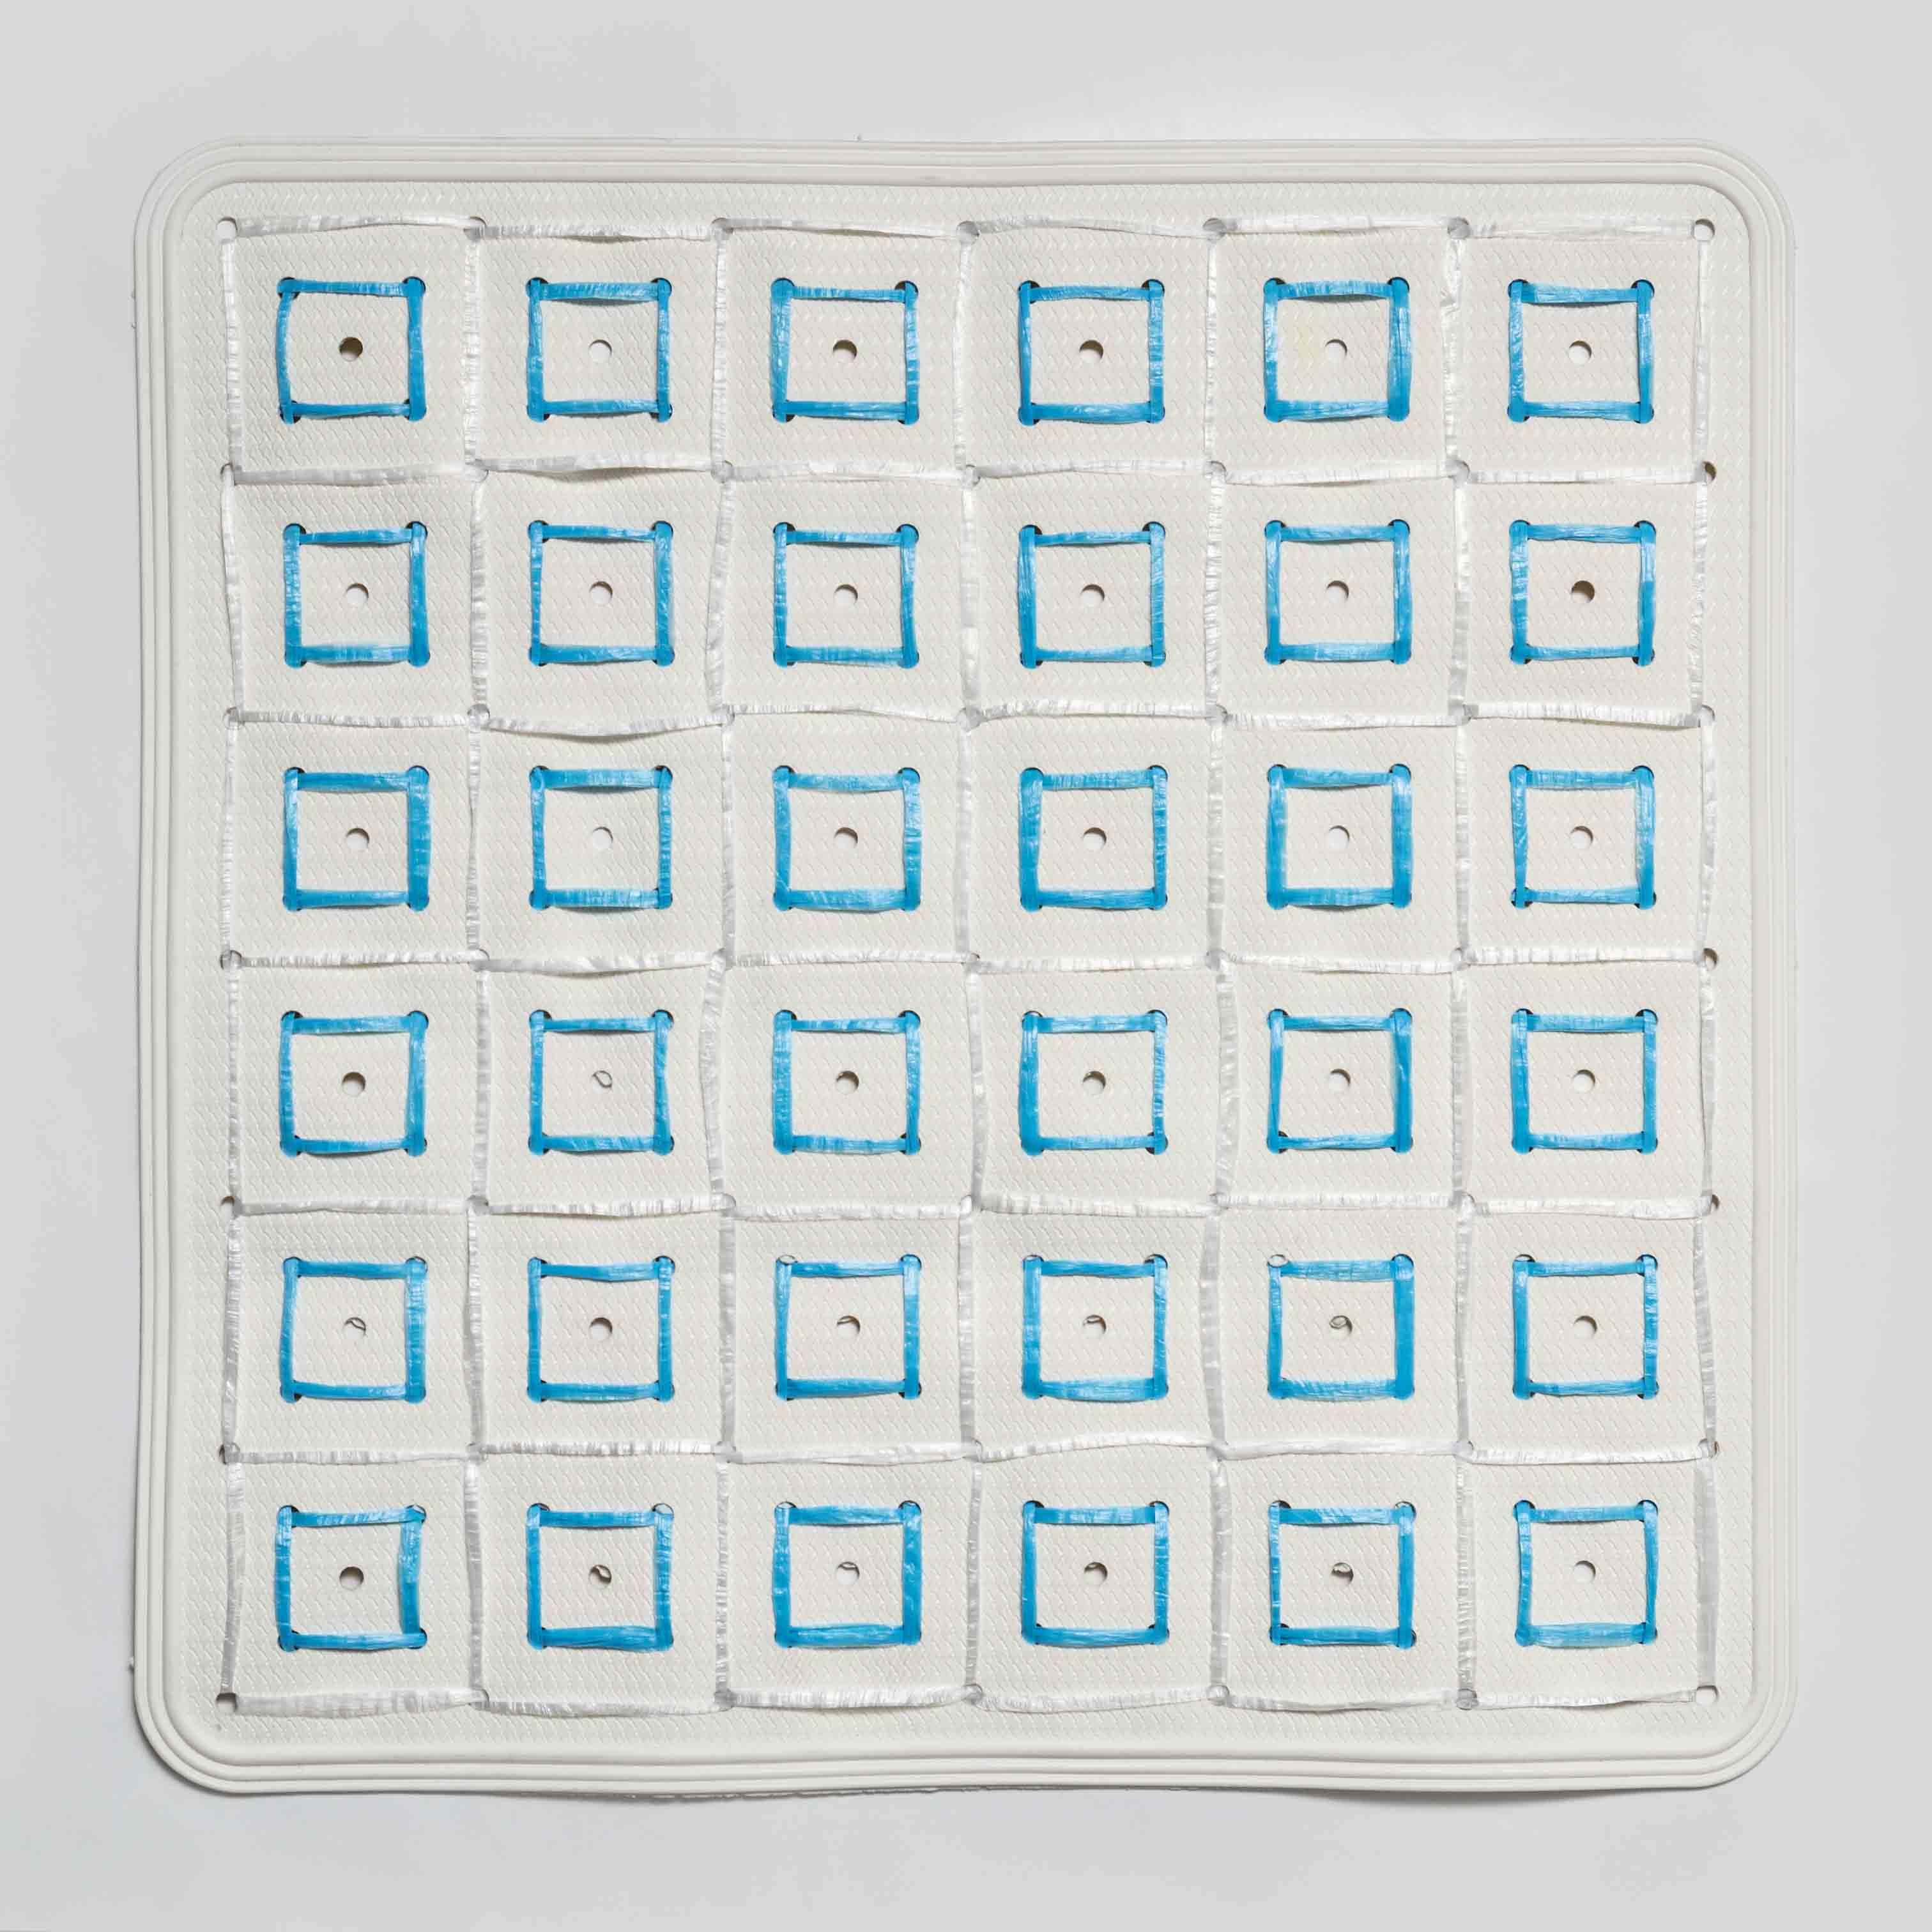 Mirando a oriente, cintas ensambladas, 52 x 52 cm, 2012